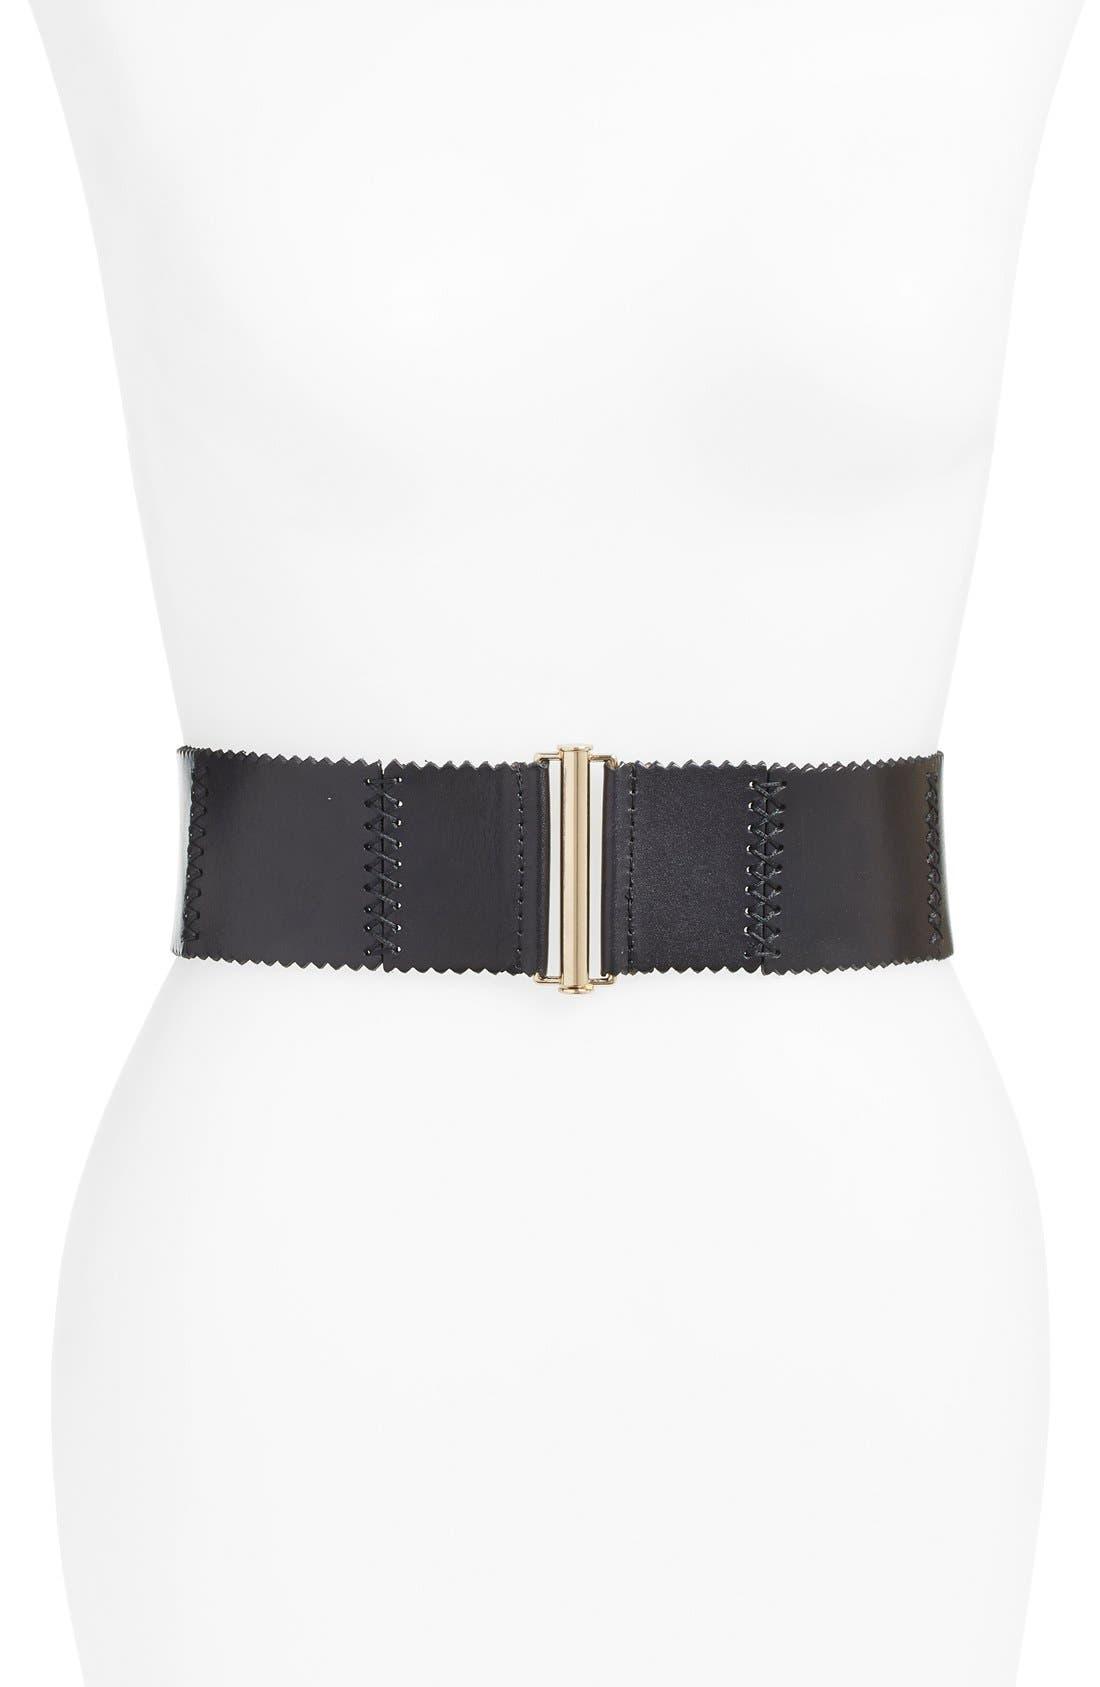 'Woodland' Stitched Leather Belt,                             Main thumbnail 1, color,                             BLACK